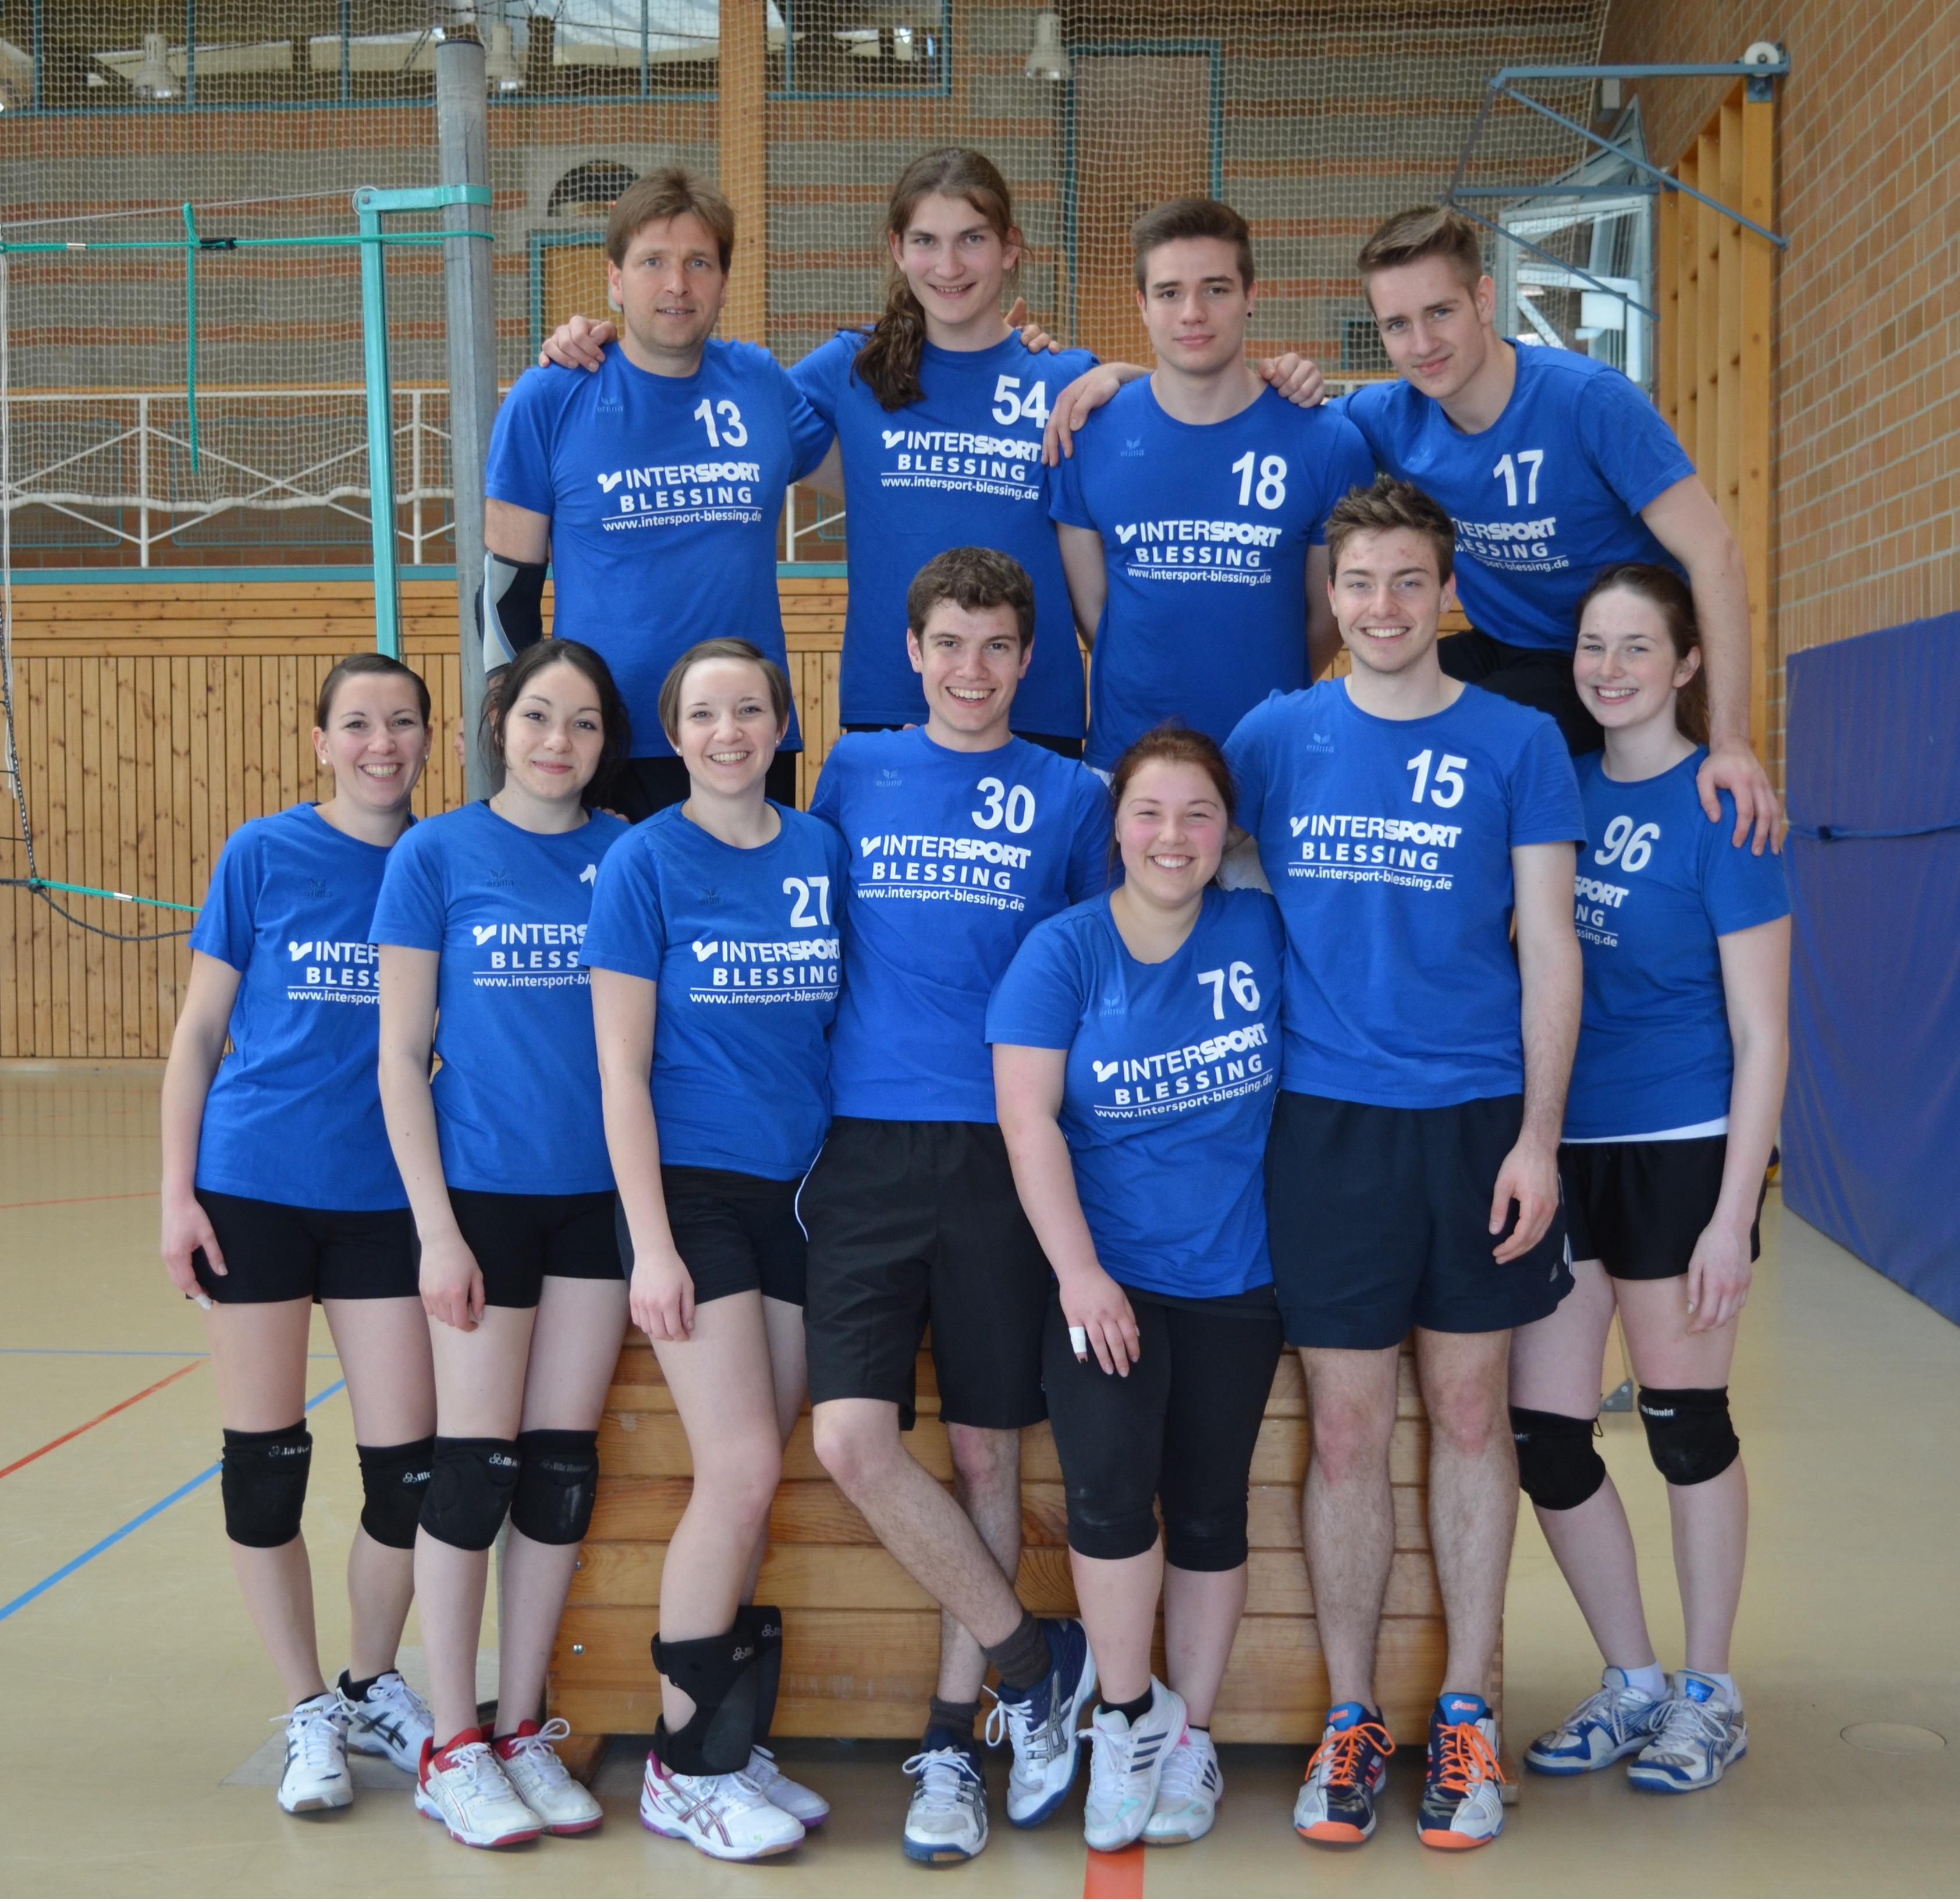 LK Team 2014/15